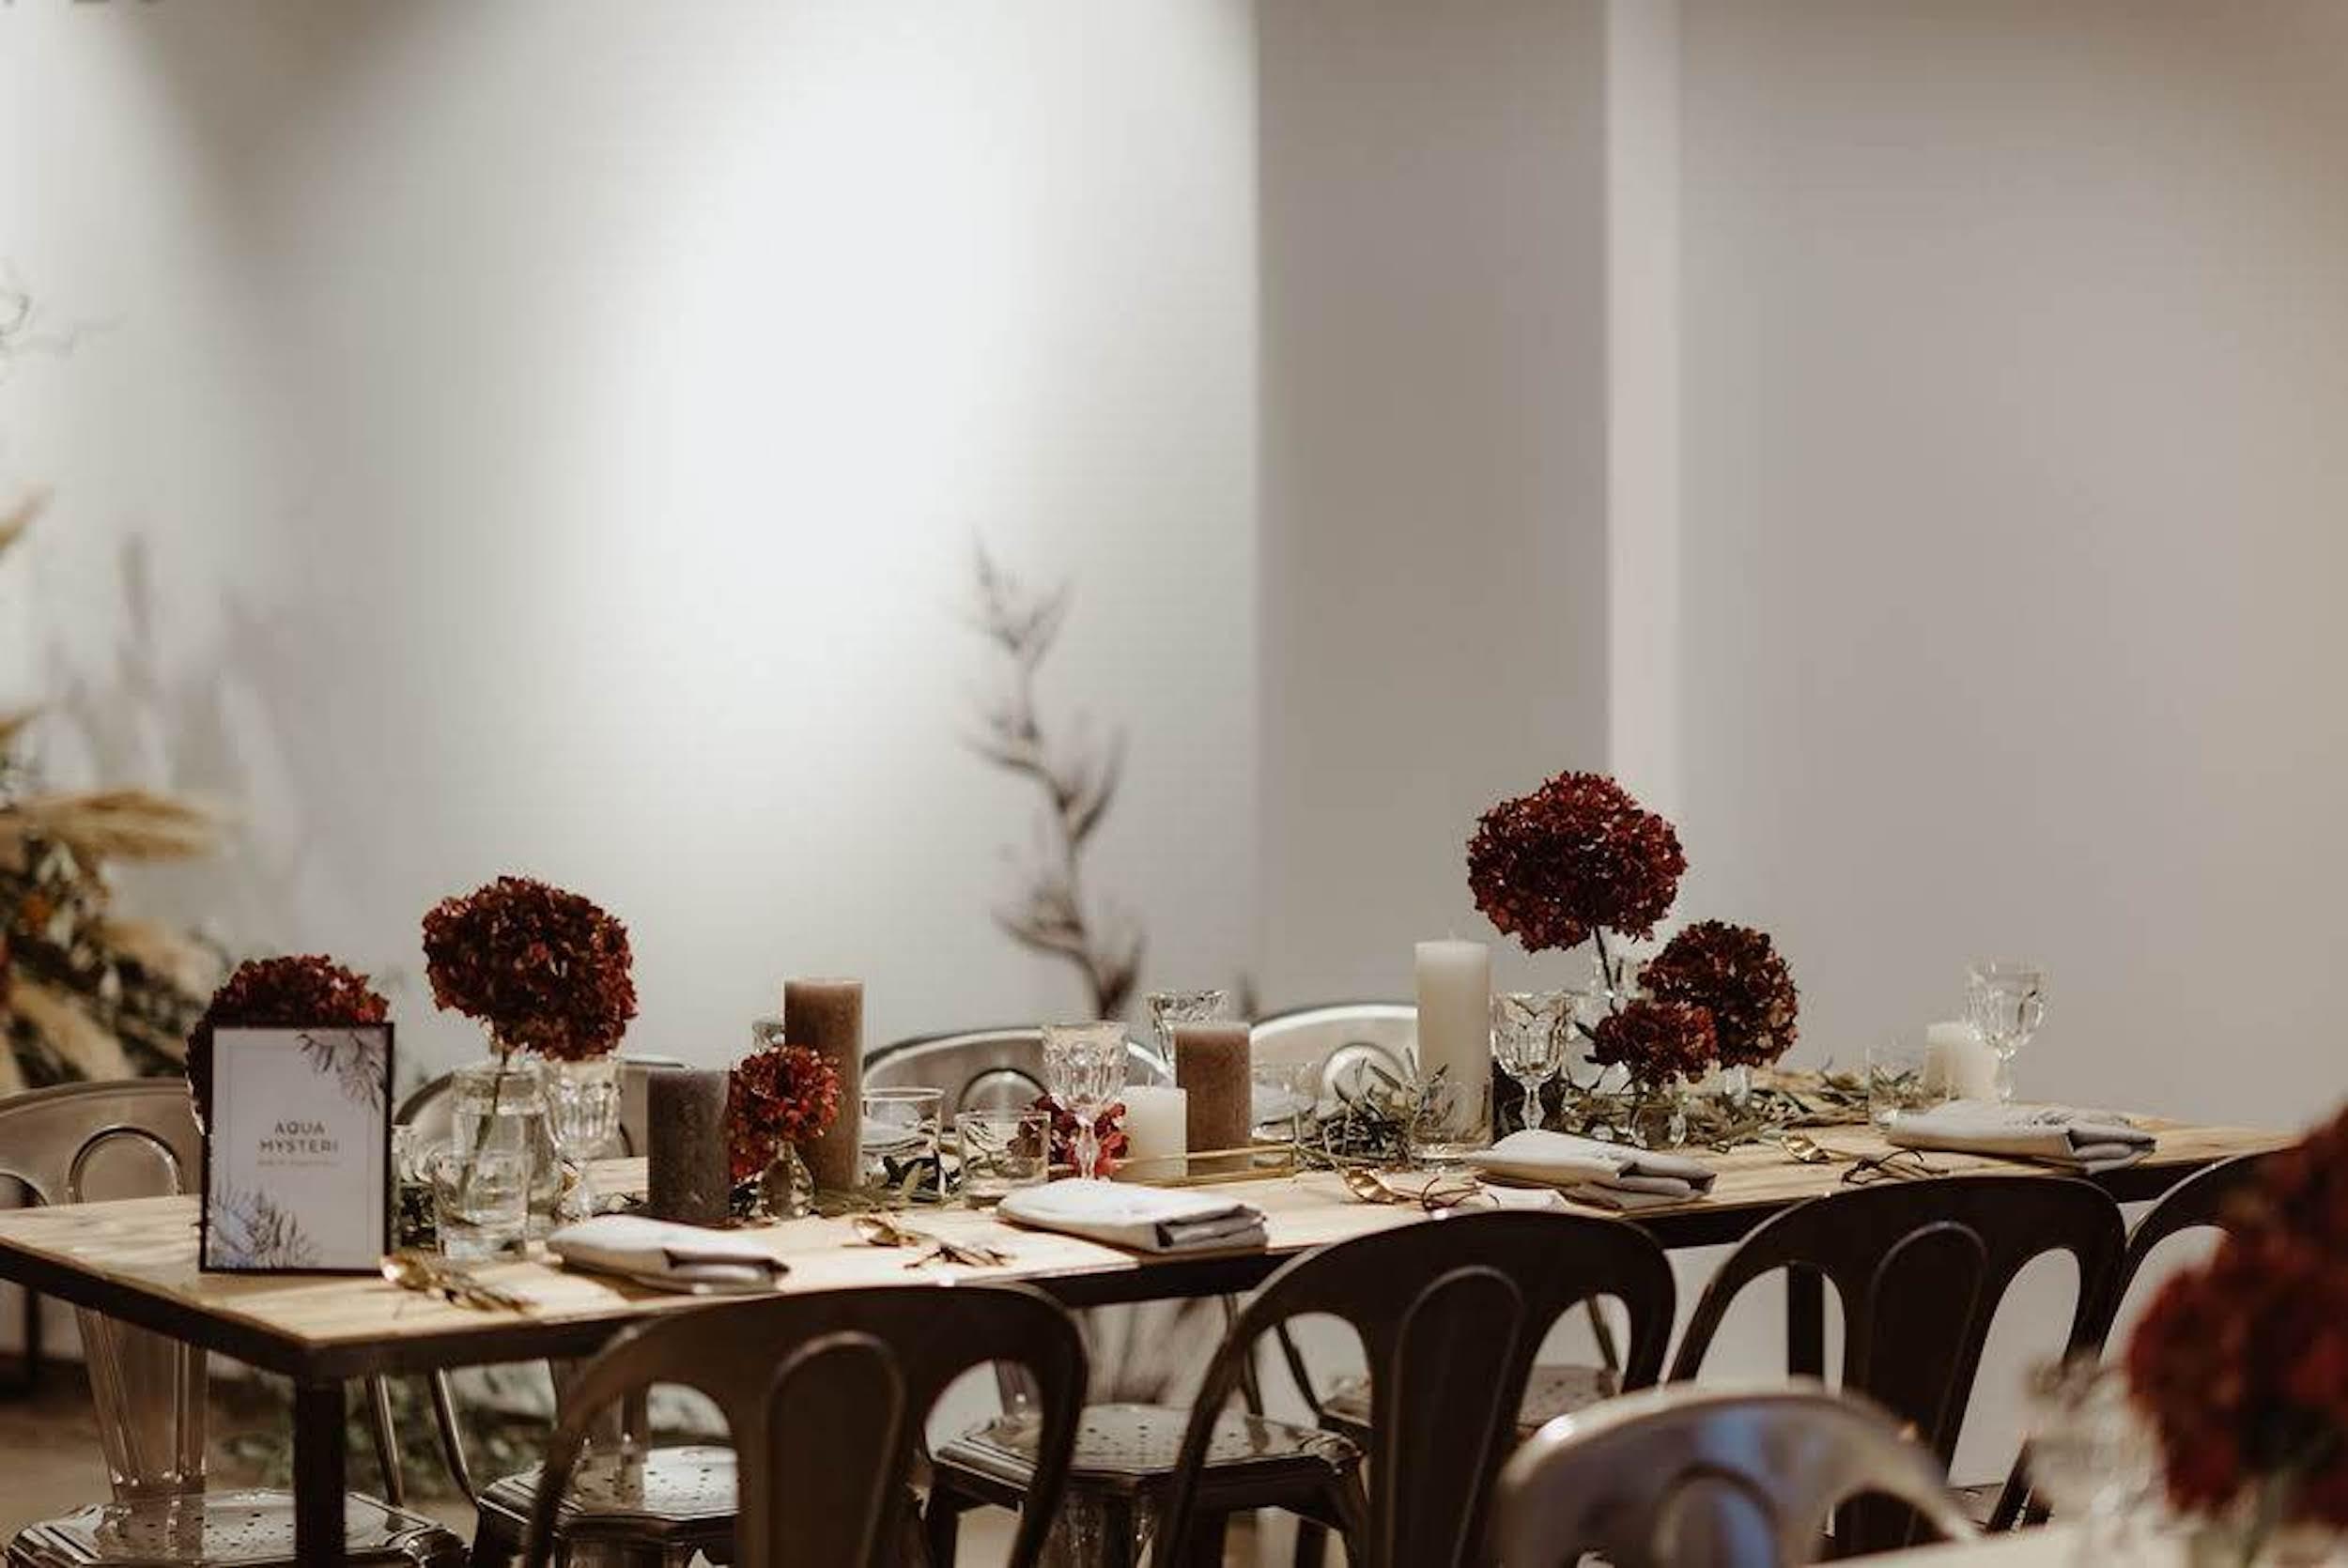 refletfleurs-fleuriste-scenographie-event-corporate-diner-influenceurs-presse-paris-3